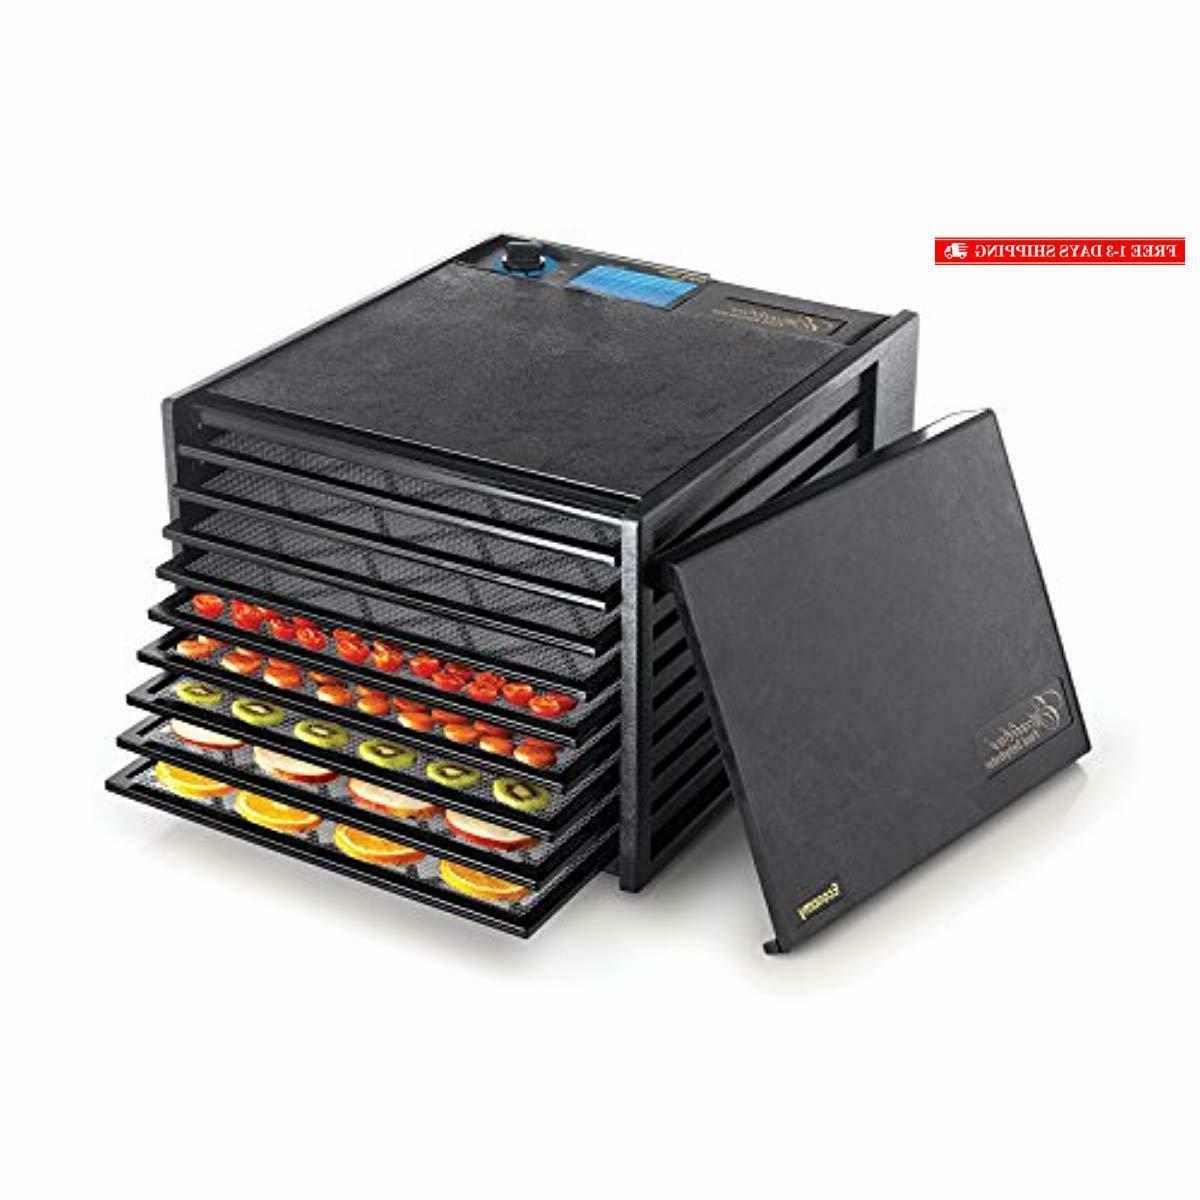 2900ecb 9 tray food dehydrator with adjustable